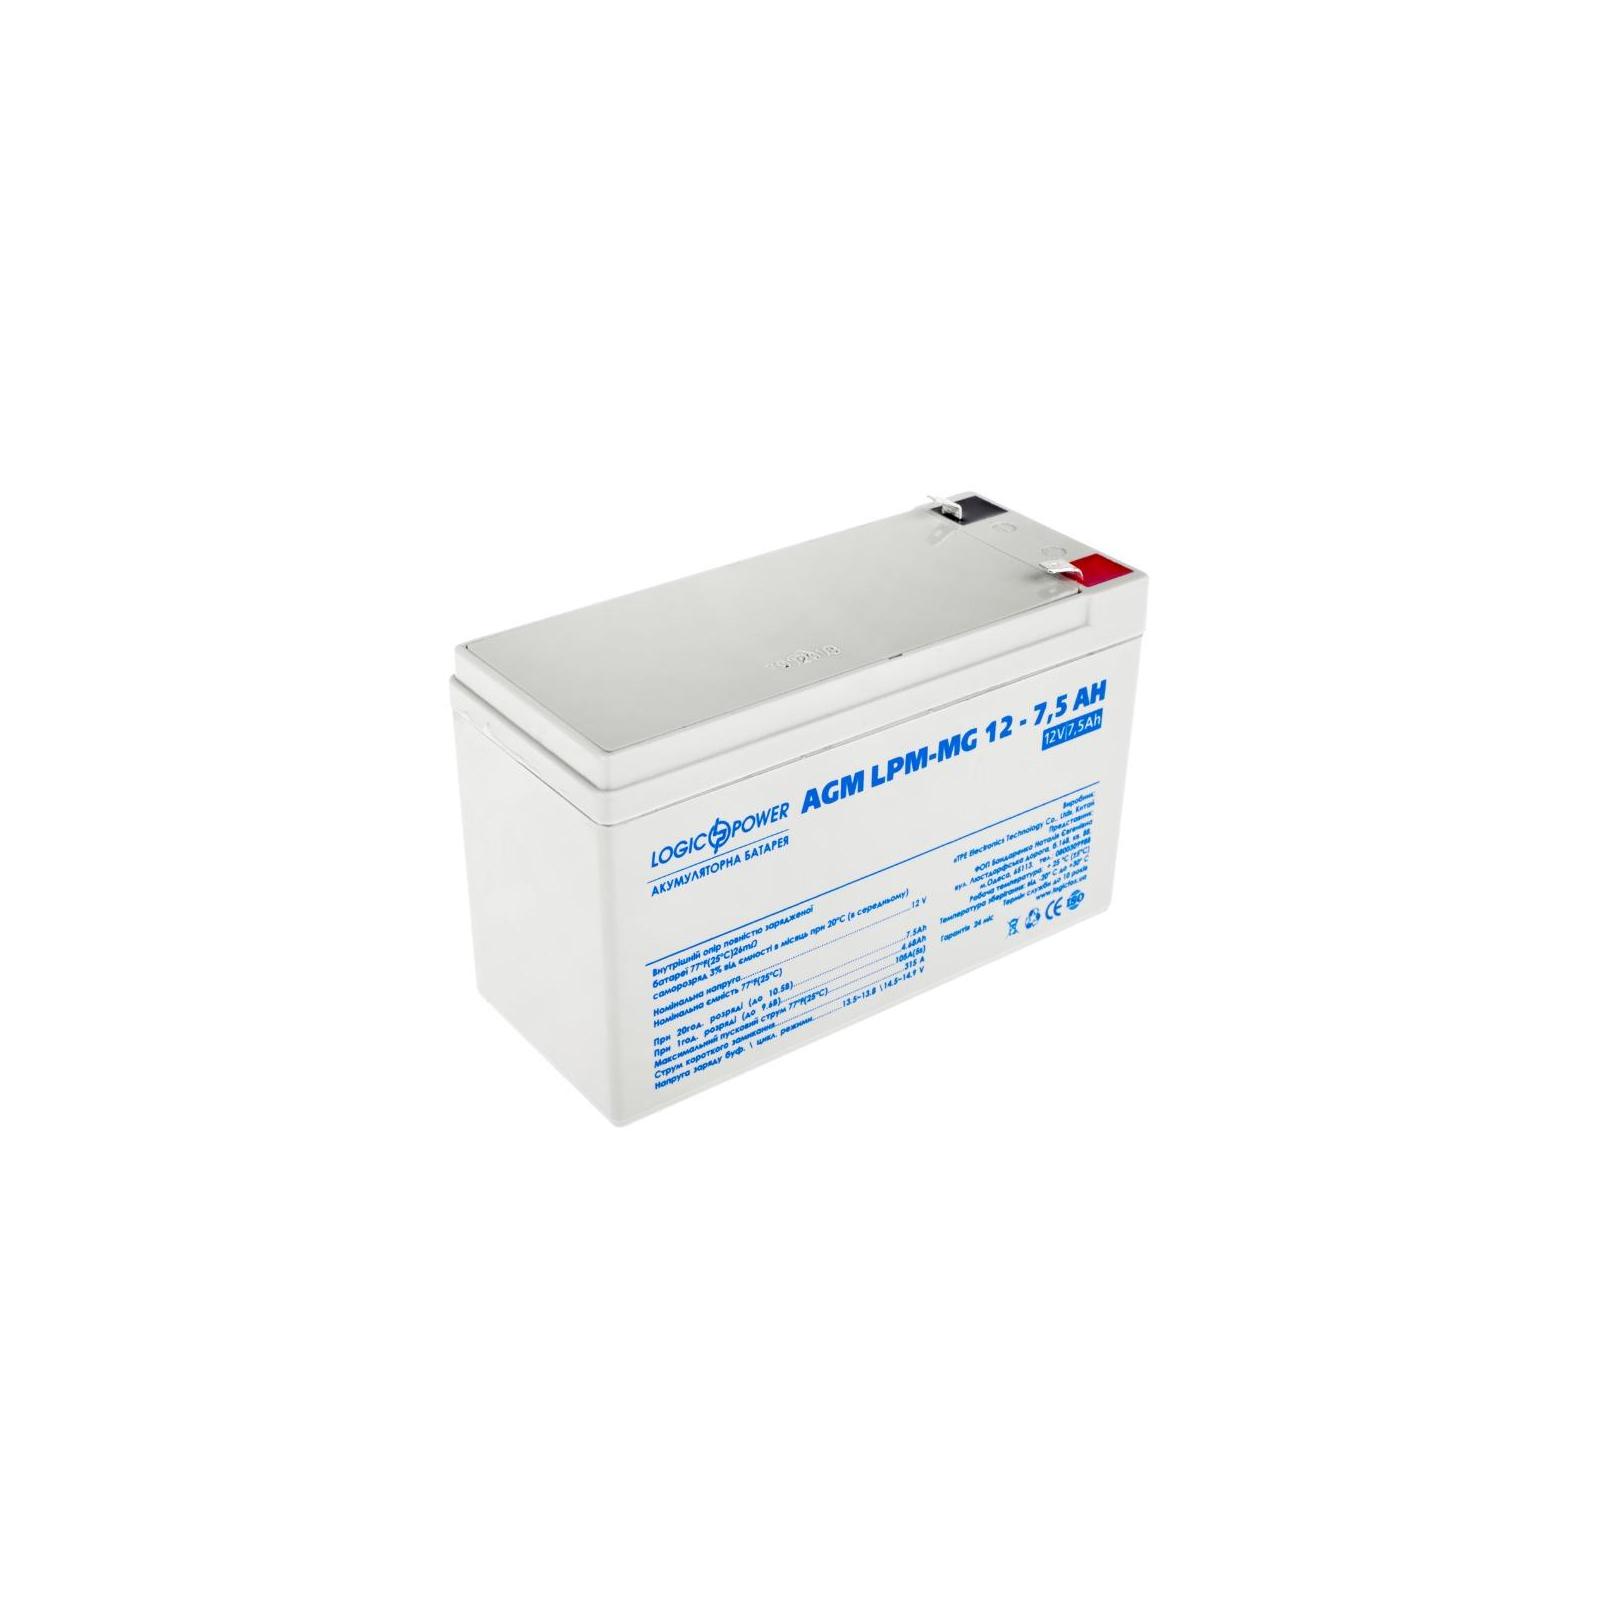 Батарея к ИБП LogicPower LPM MG 12В 7.5Ач (6554)